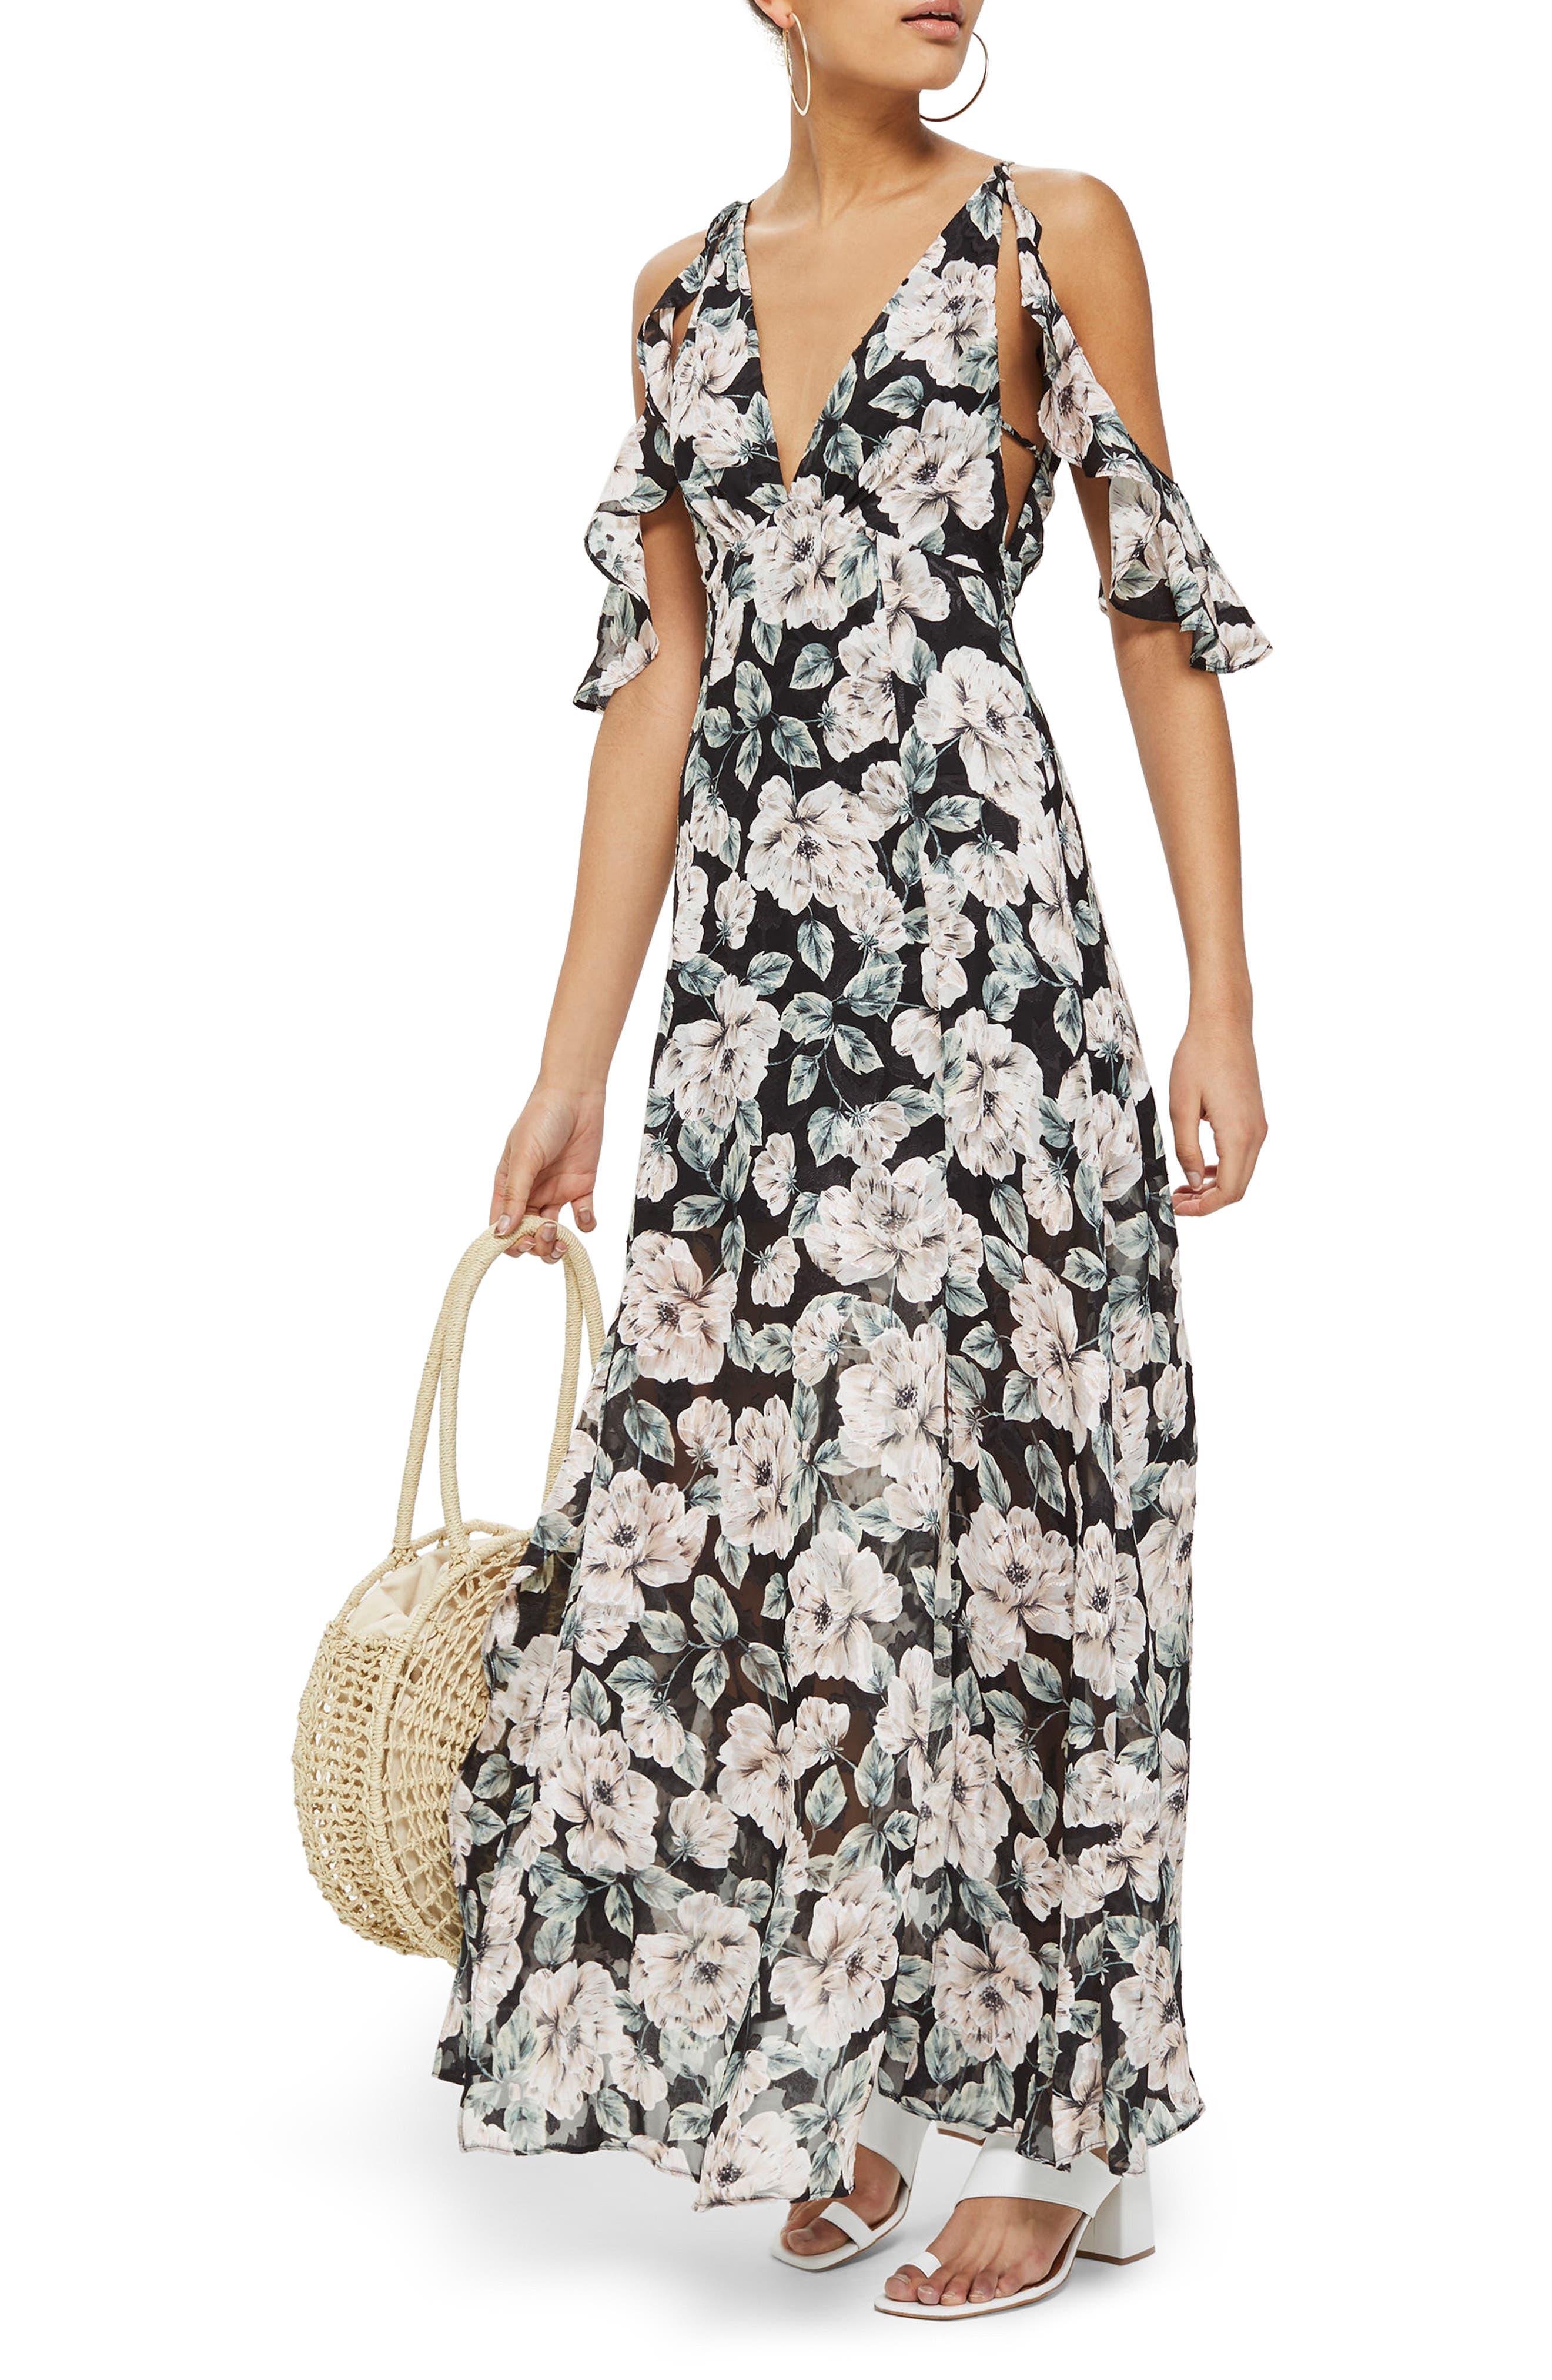 Devoré Floral Cold Shoulder Dress,                         Main,                         color, Black Multi